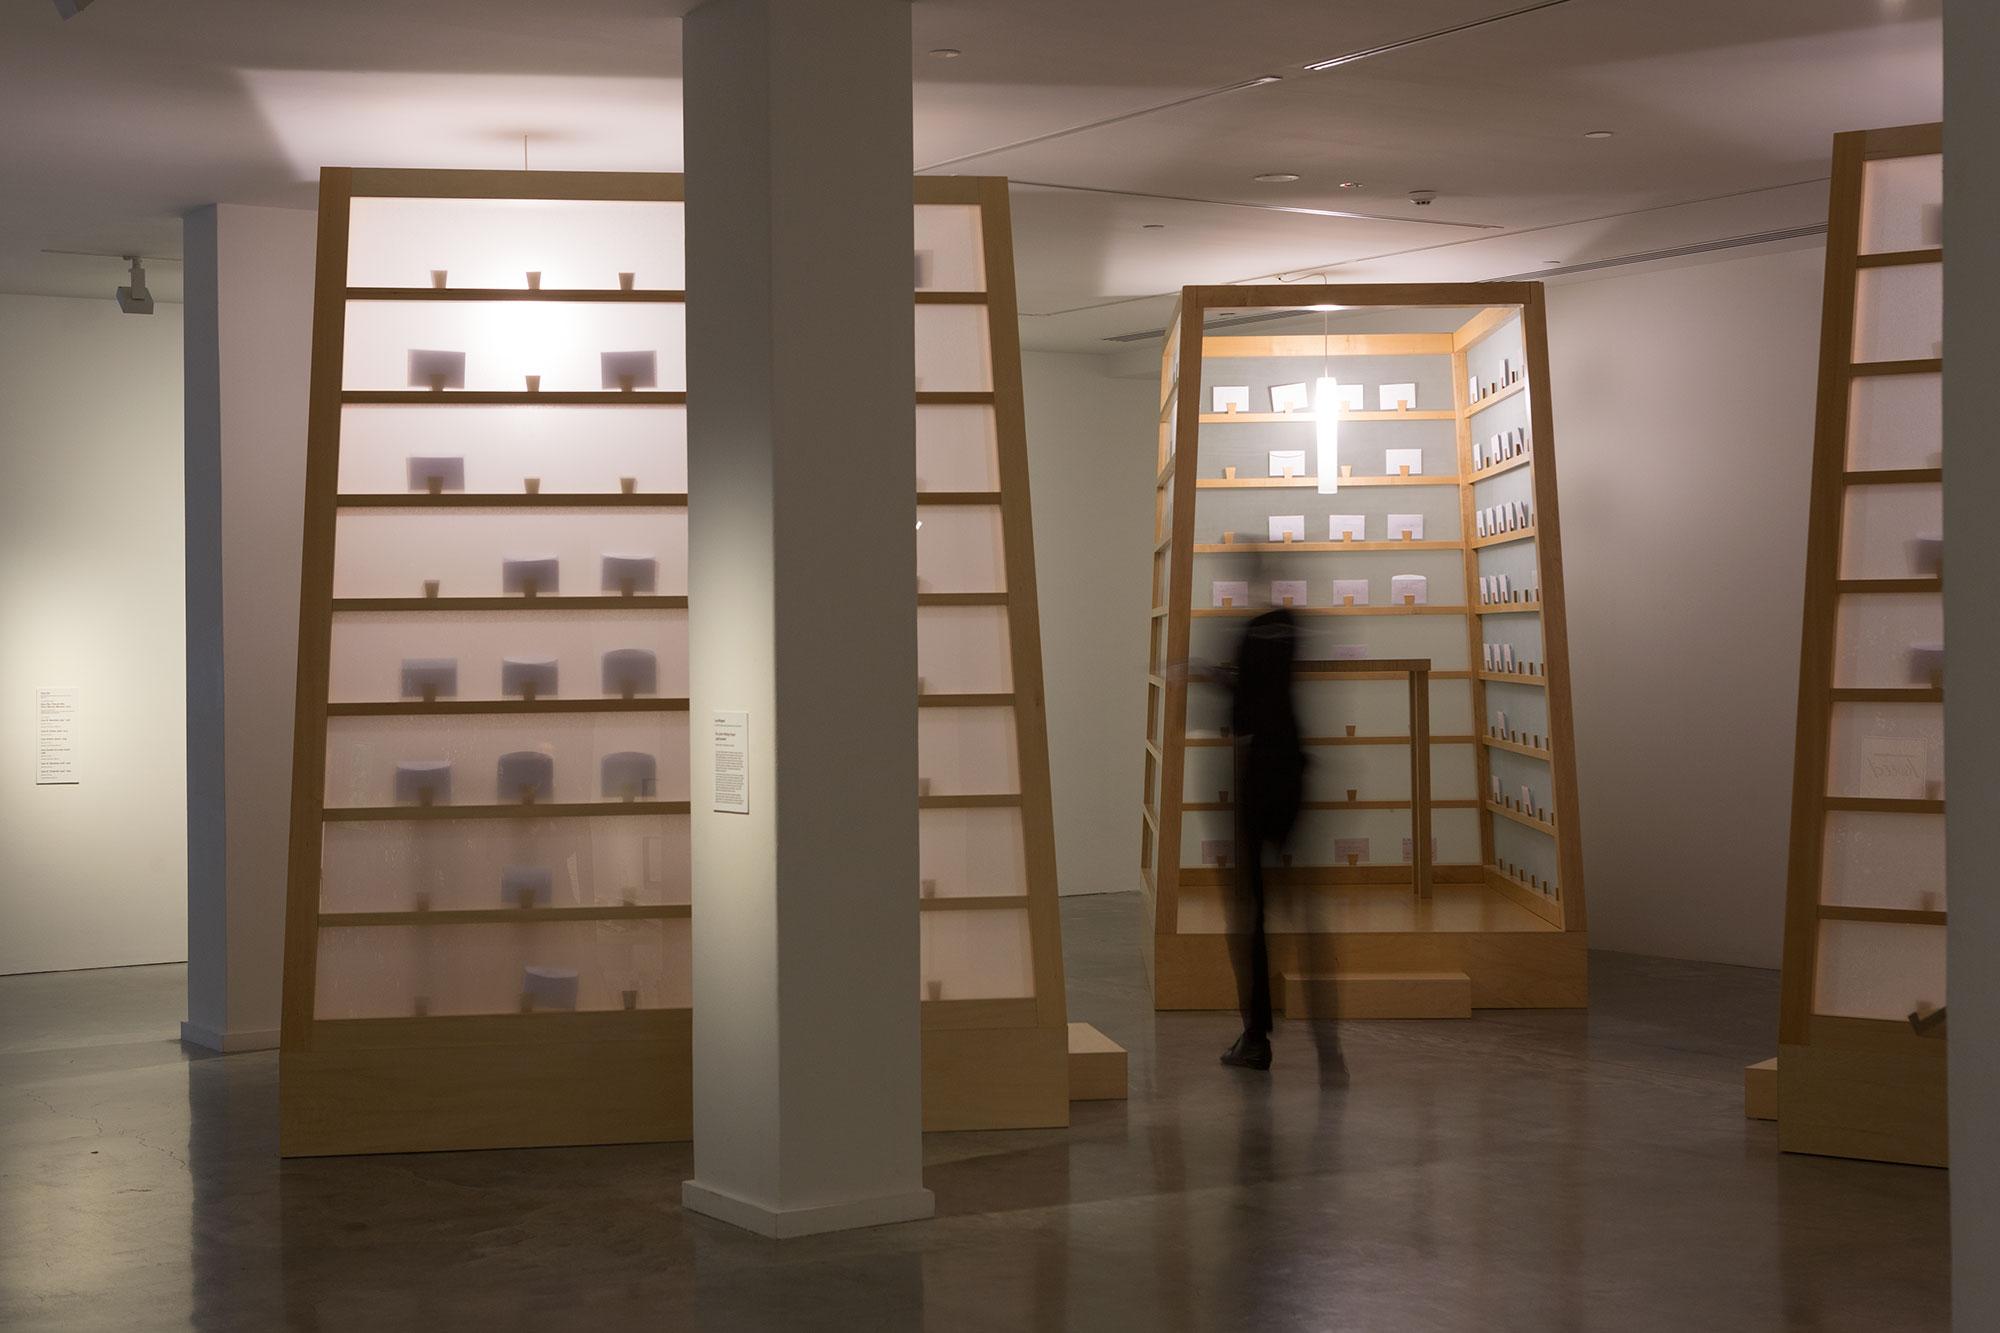 MCA installation, 2017